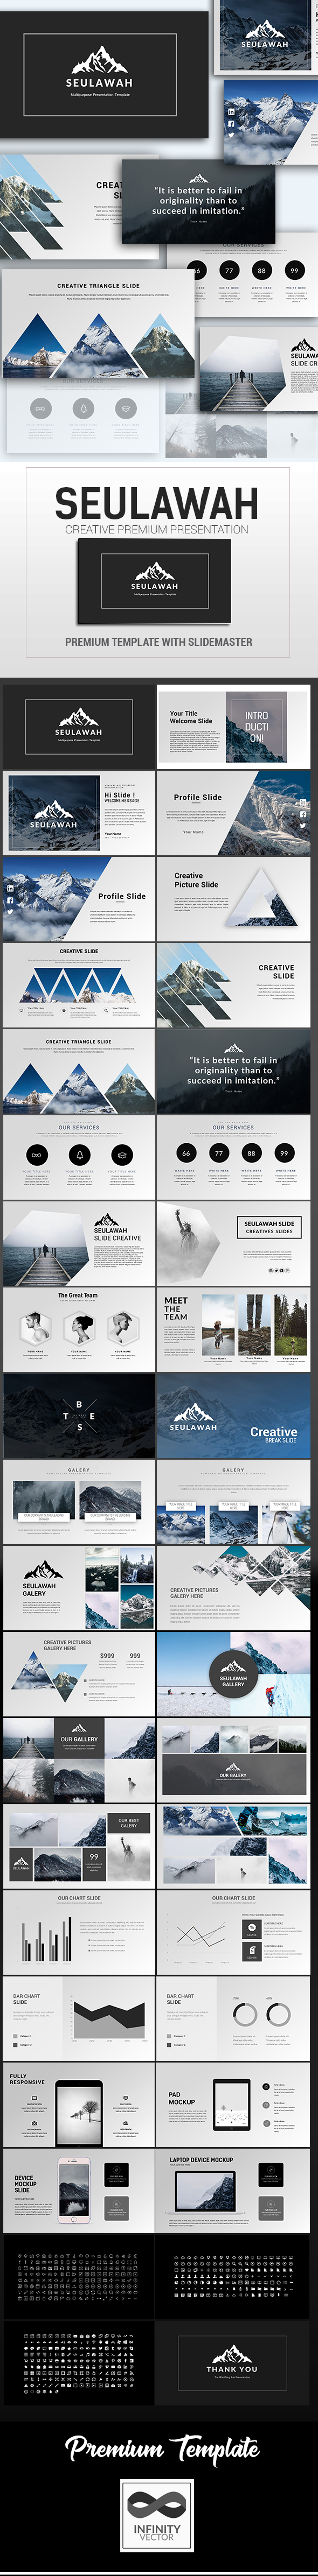 Seulawah Creative Presentation Google Slide - Google Slides Presentation Templates